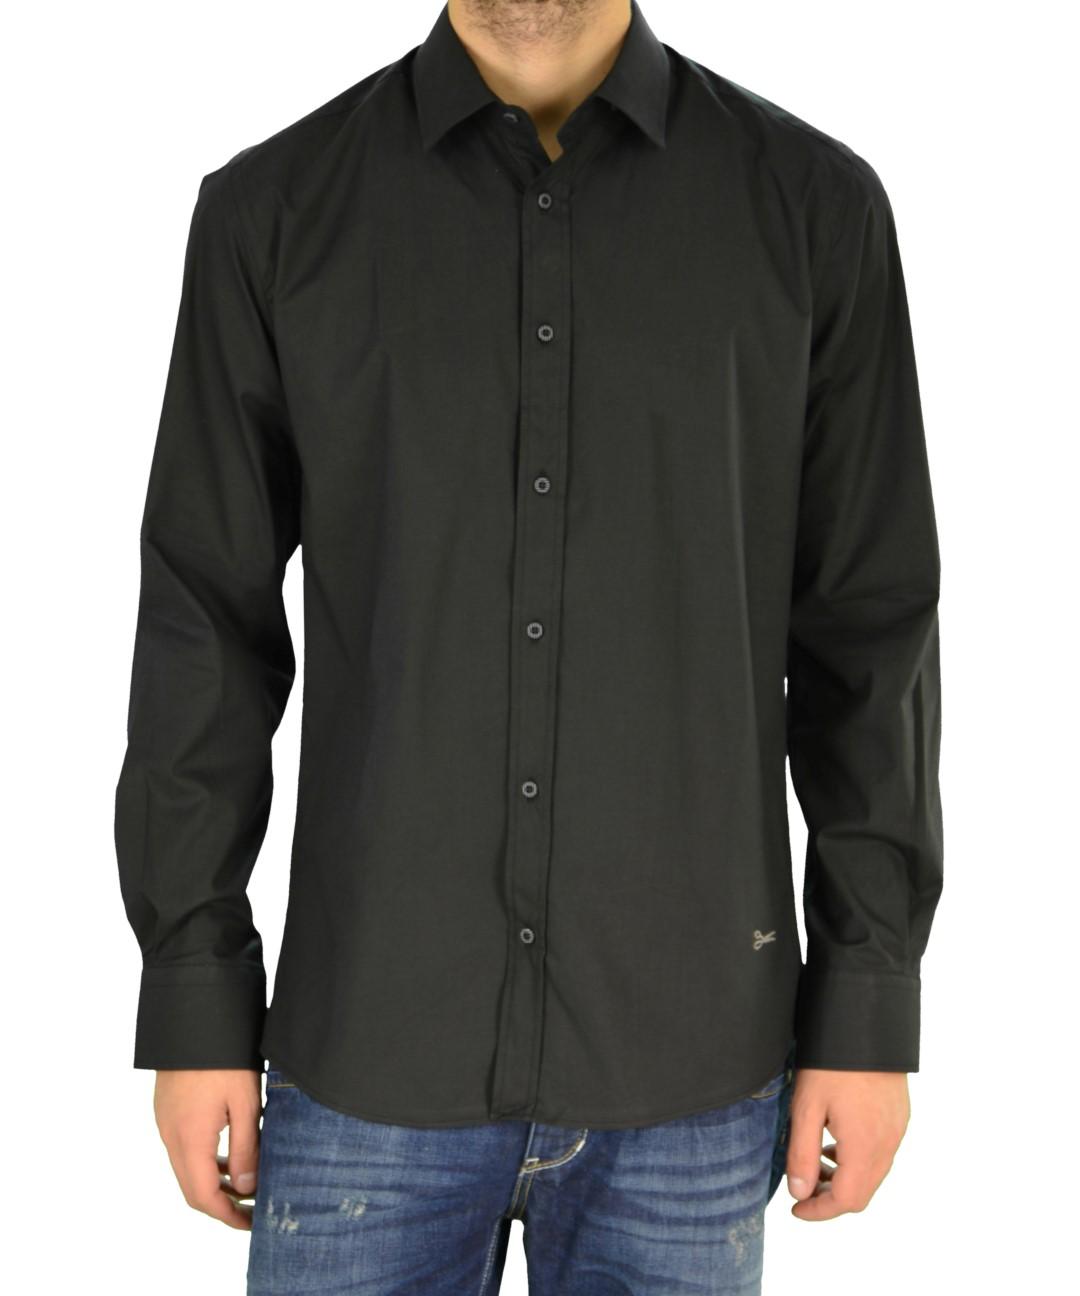 Ben Tailor μαύρο πουκάμισο 185210B 89b05c4a213